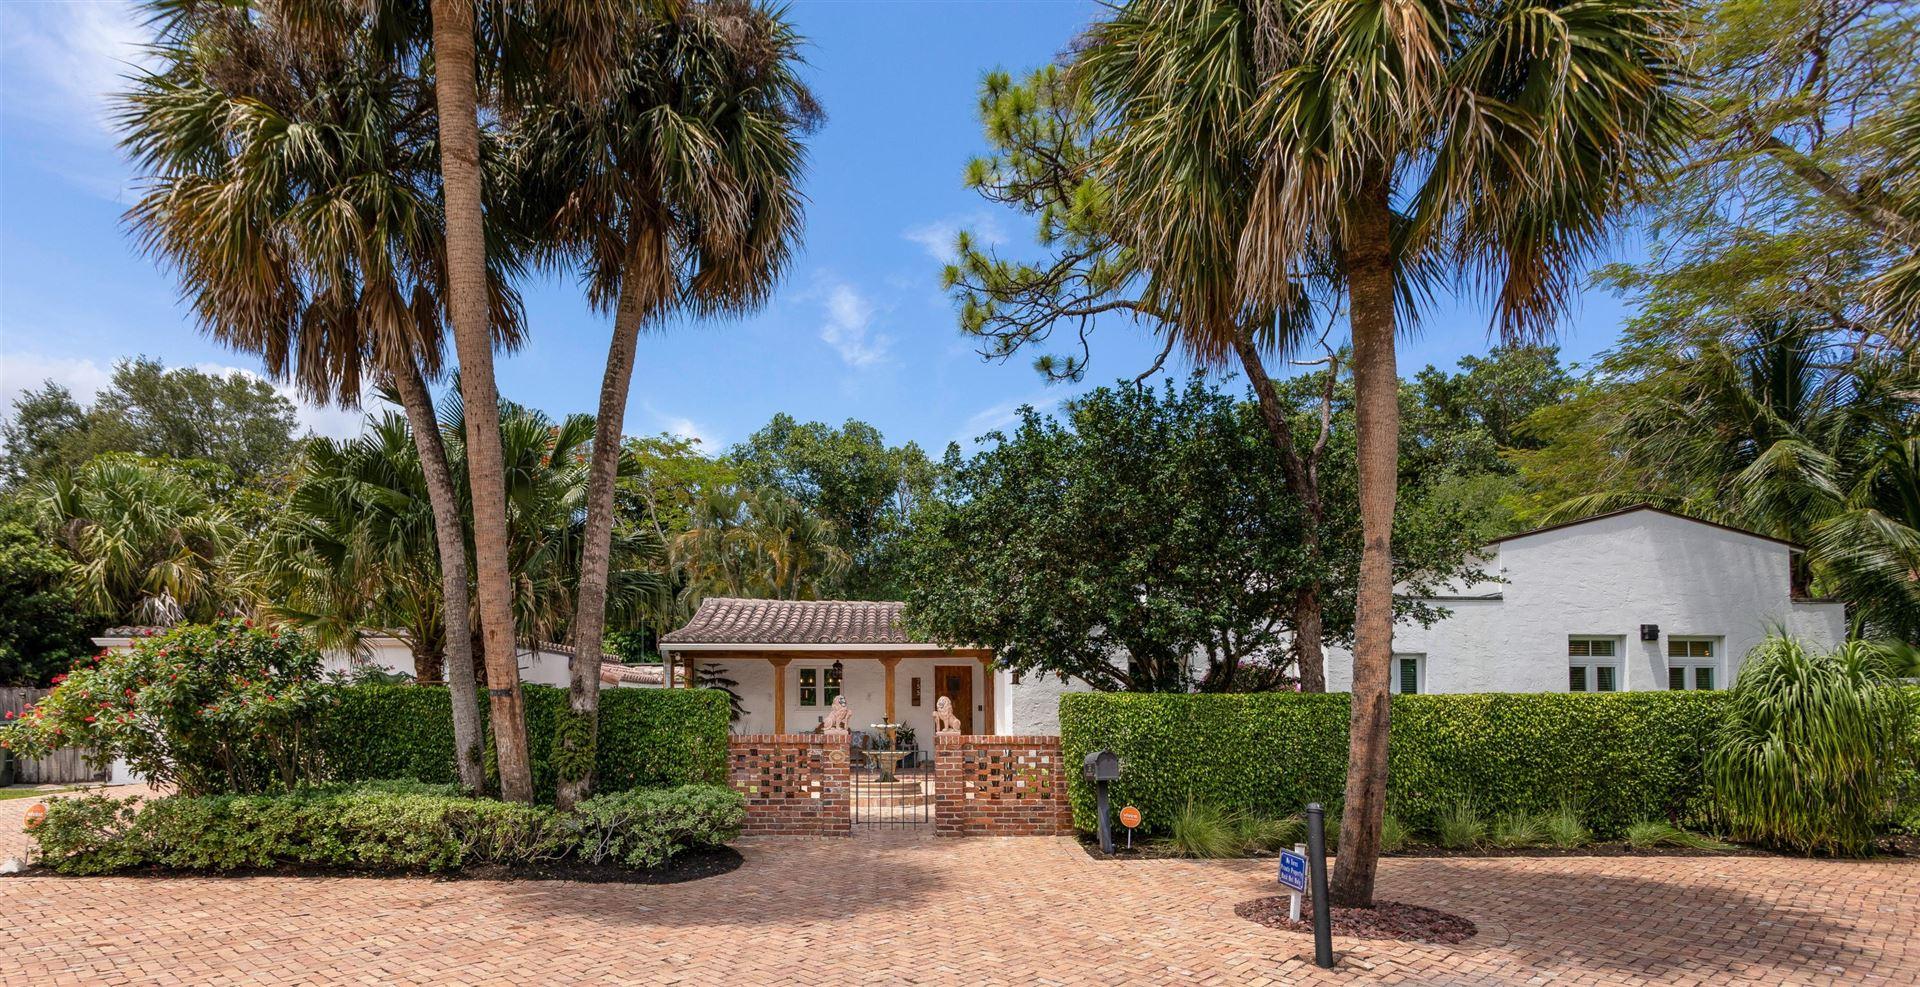 755 Azalea Street, Boca Raton, FL 33486 - MLS#: RX-10714452